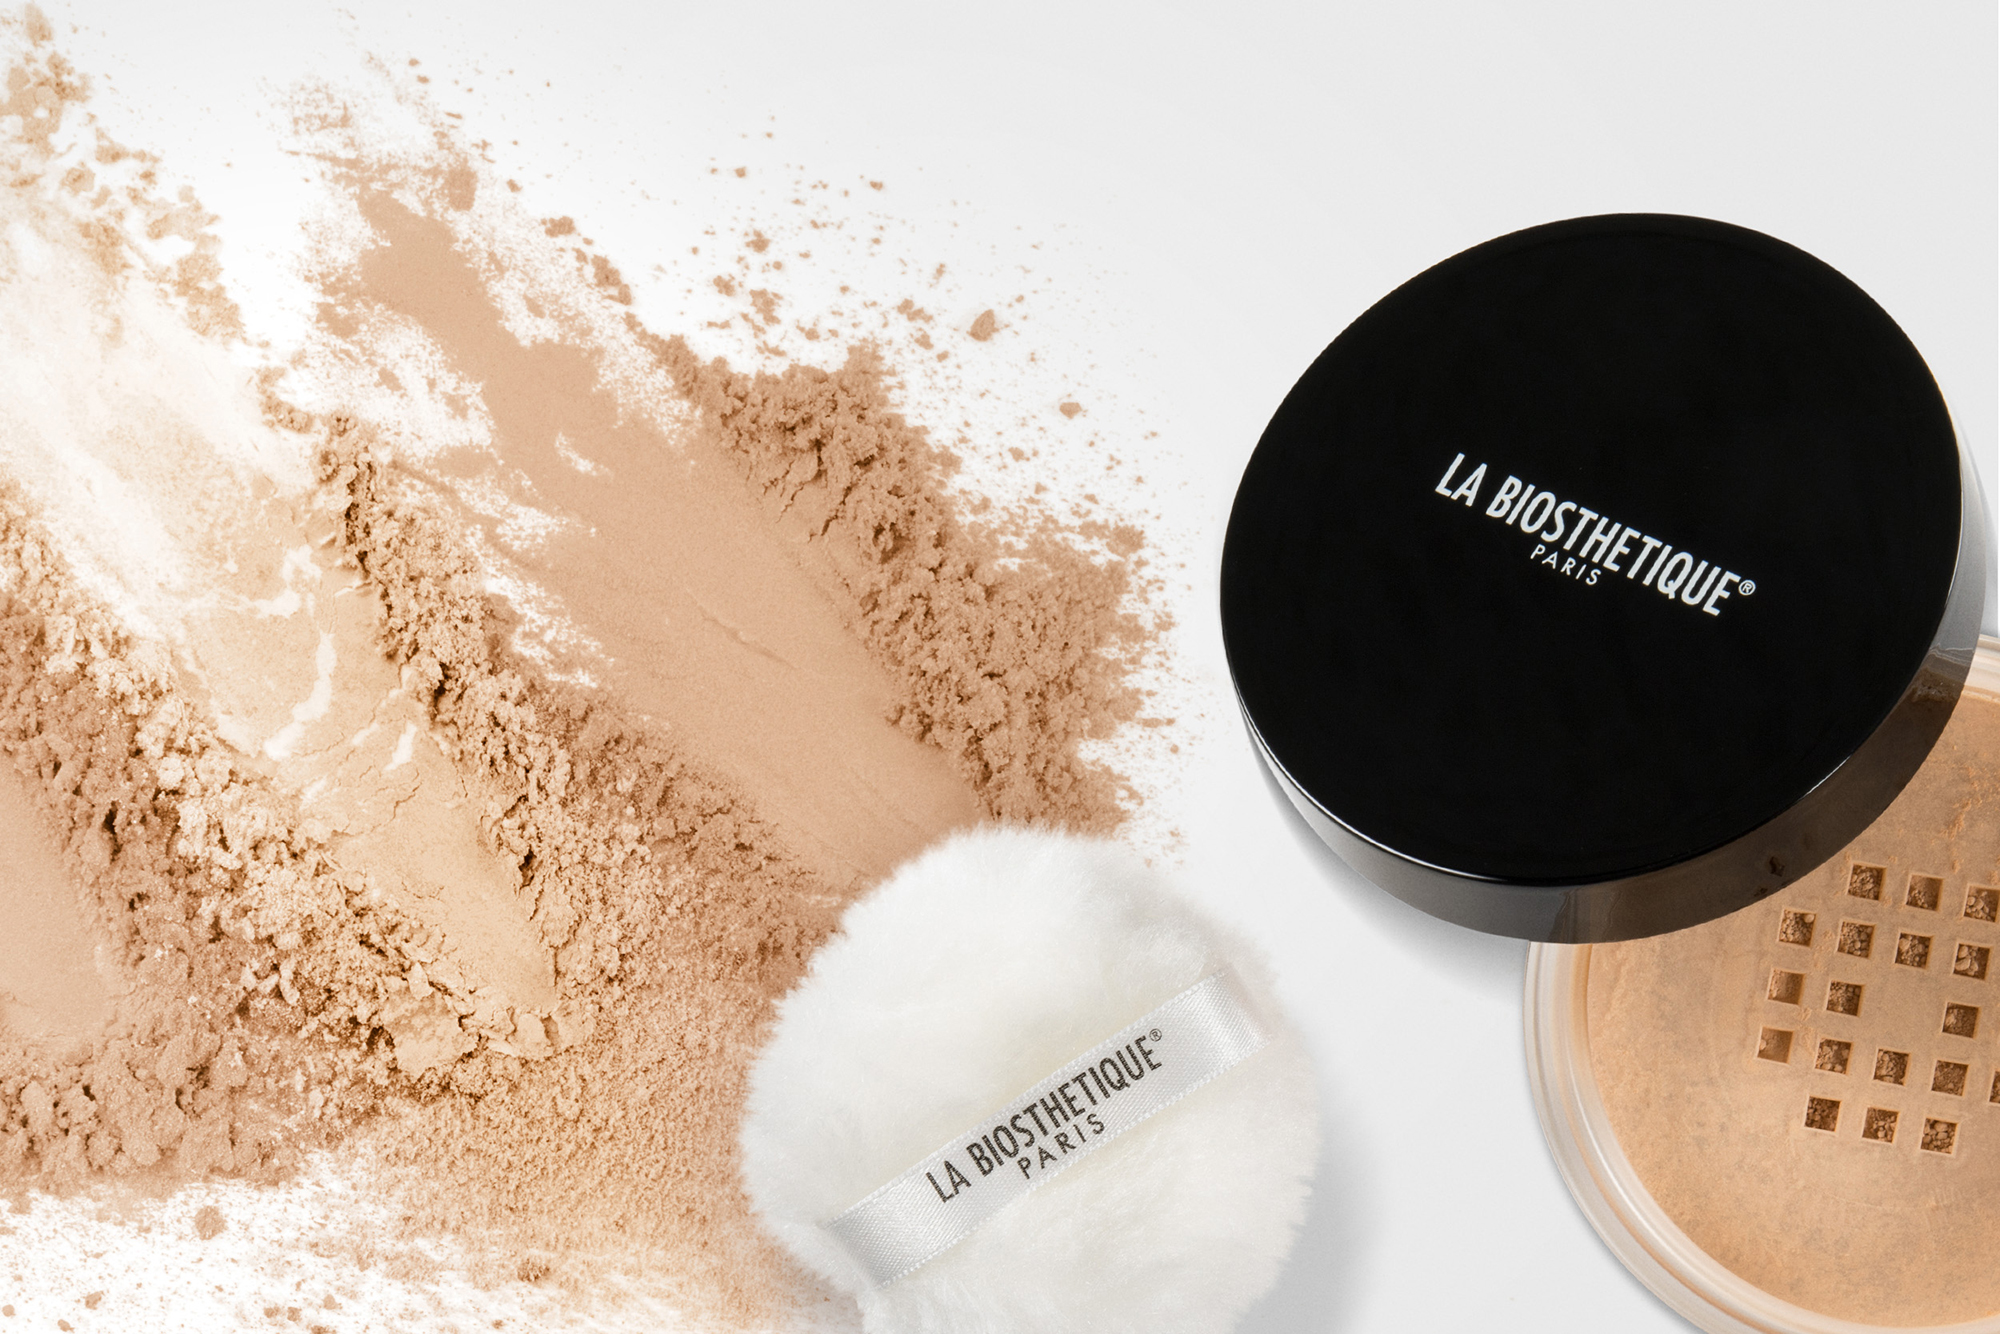 Produkte La Biosthetique | Haaratelier Grüter